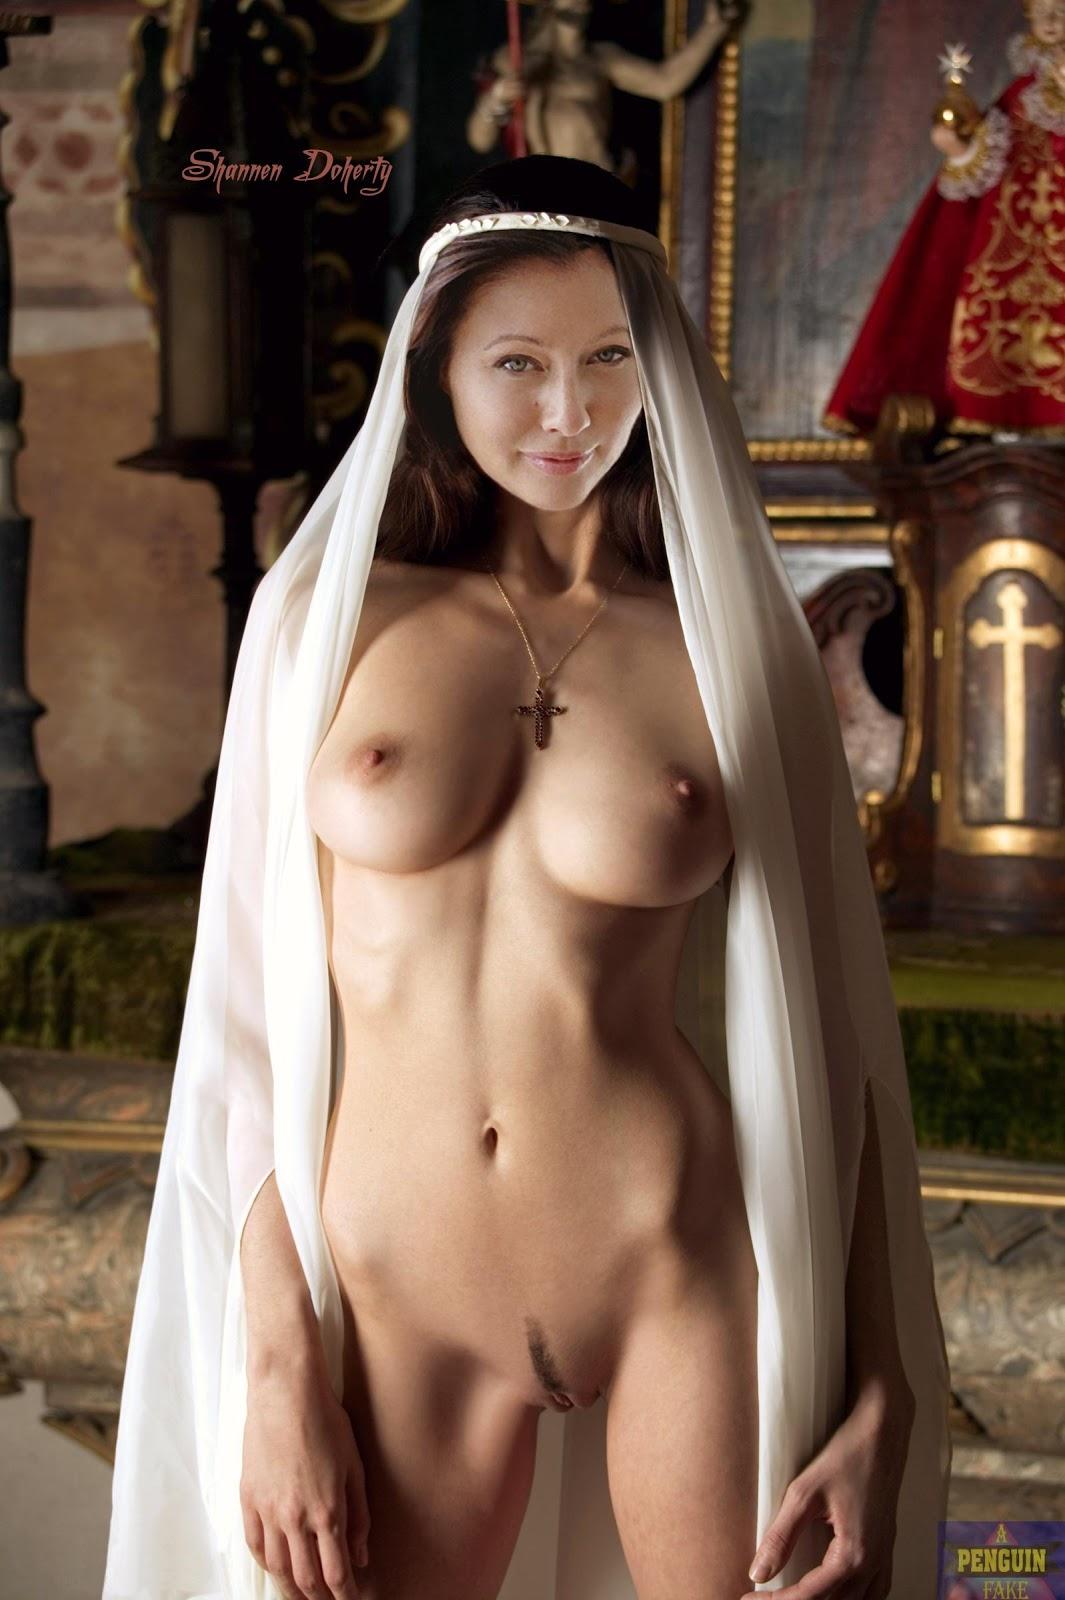 Angela Vazquez Nude angie vazquez fake sex photo sexy girls | free download nude